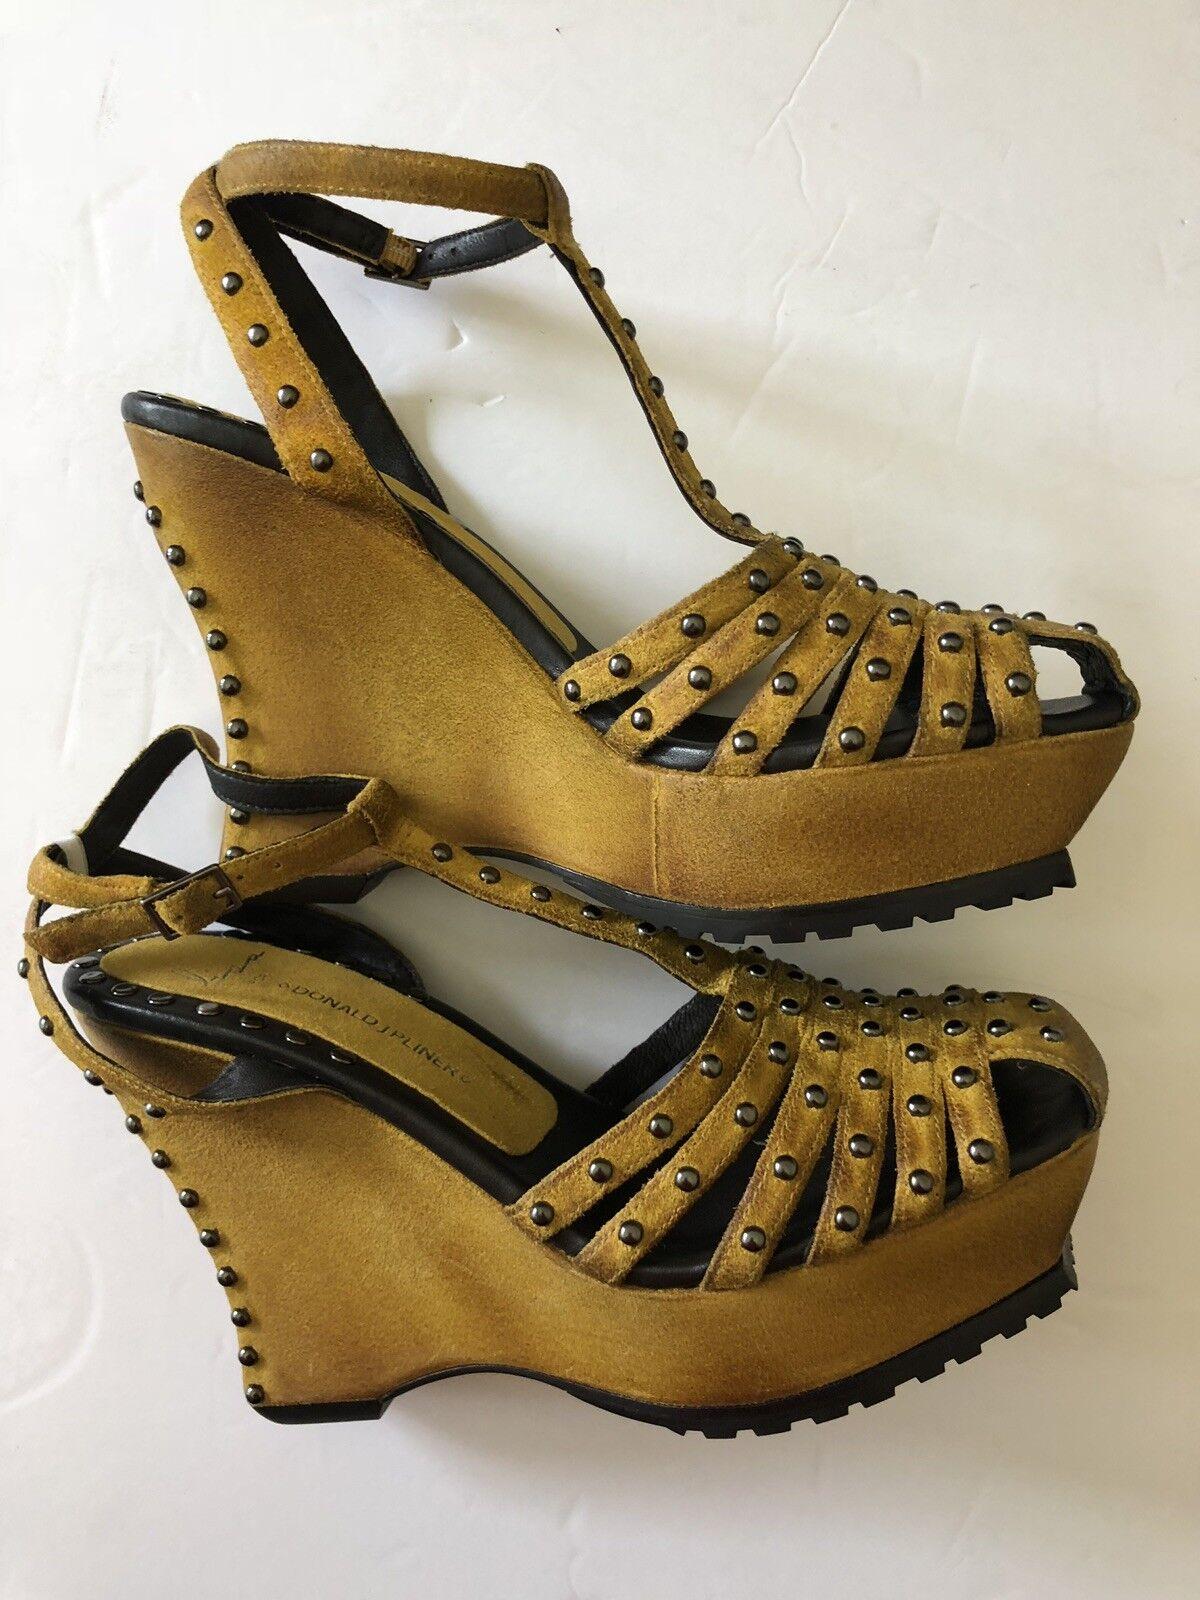 Negozio 2018 Lisa For Donald J Pliner Shiloh-ww Mustard bianca Wash Suede Suede Suede Wedge Sandals Sz 8  ultimi stili